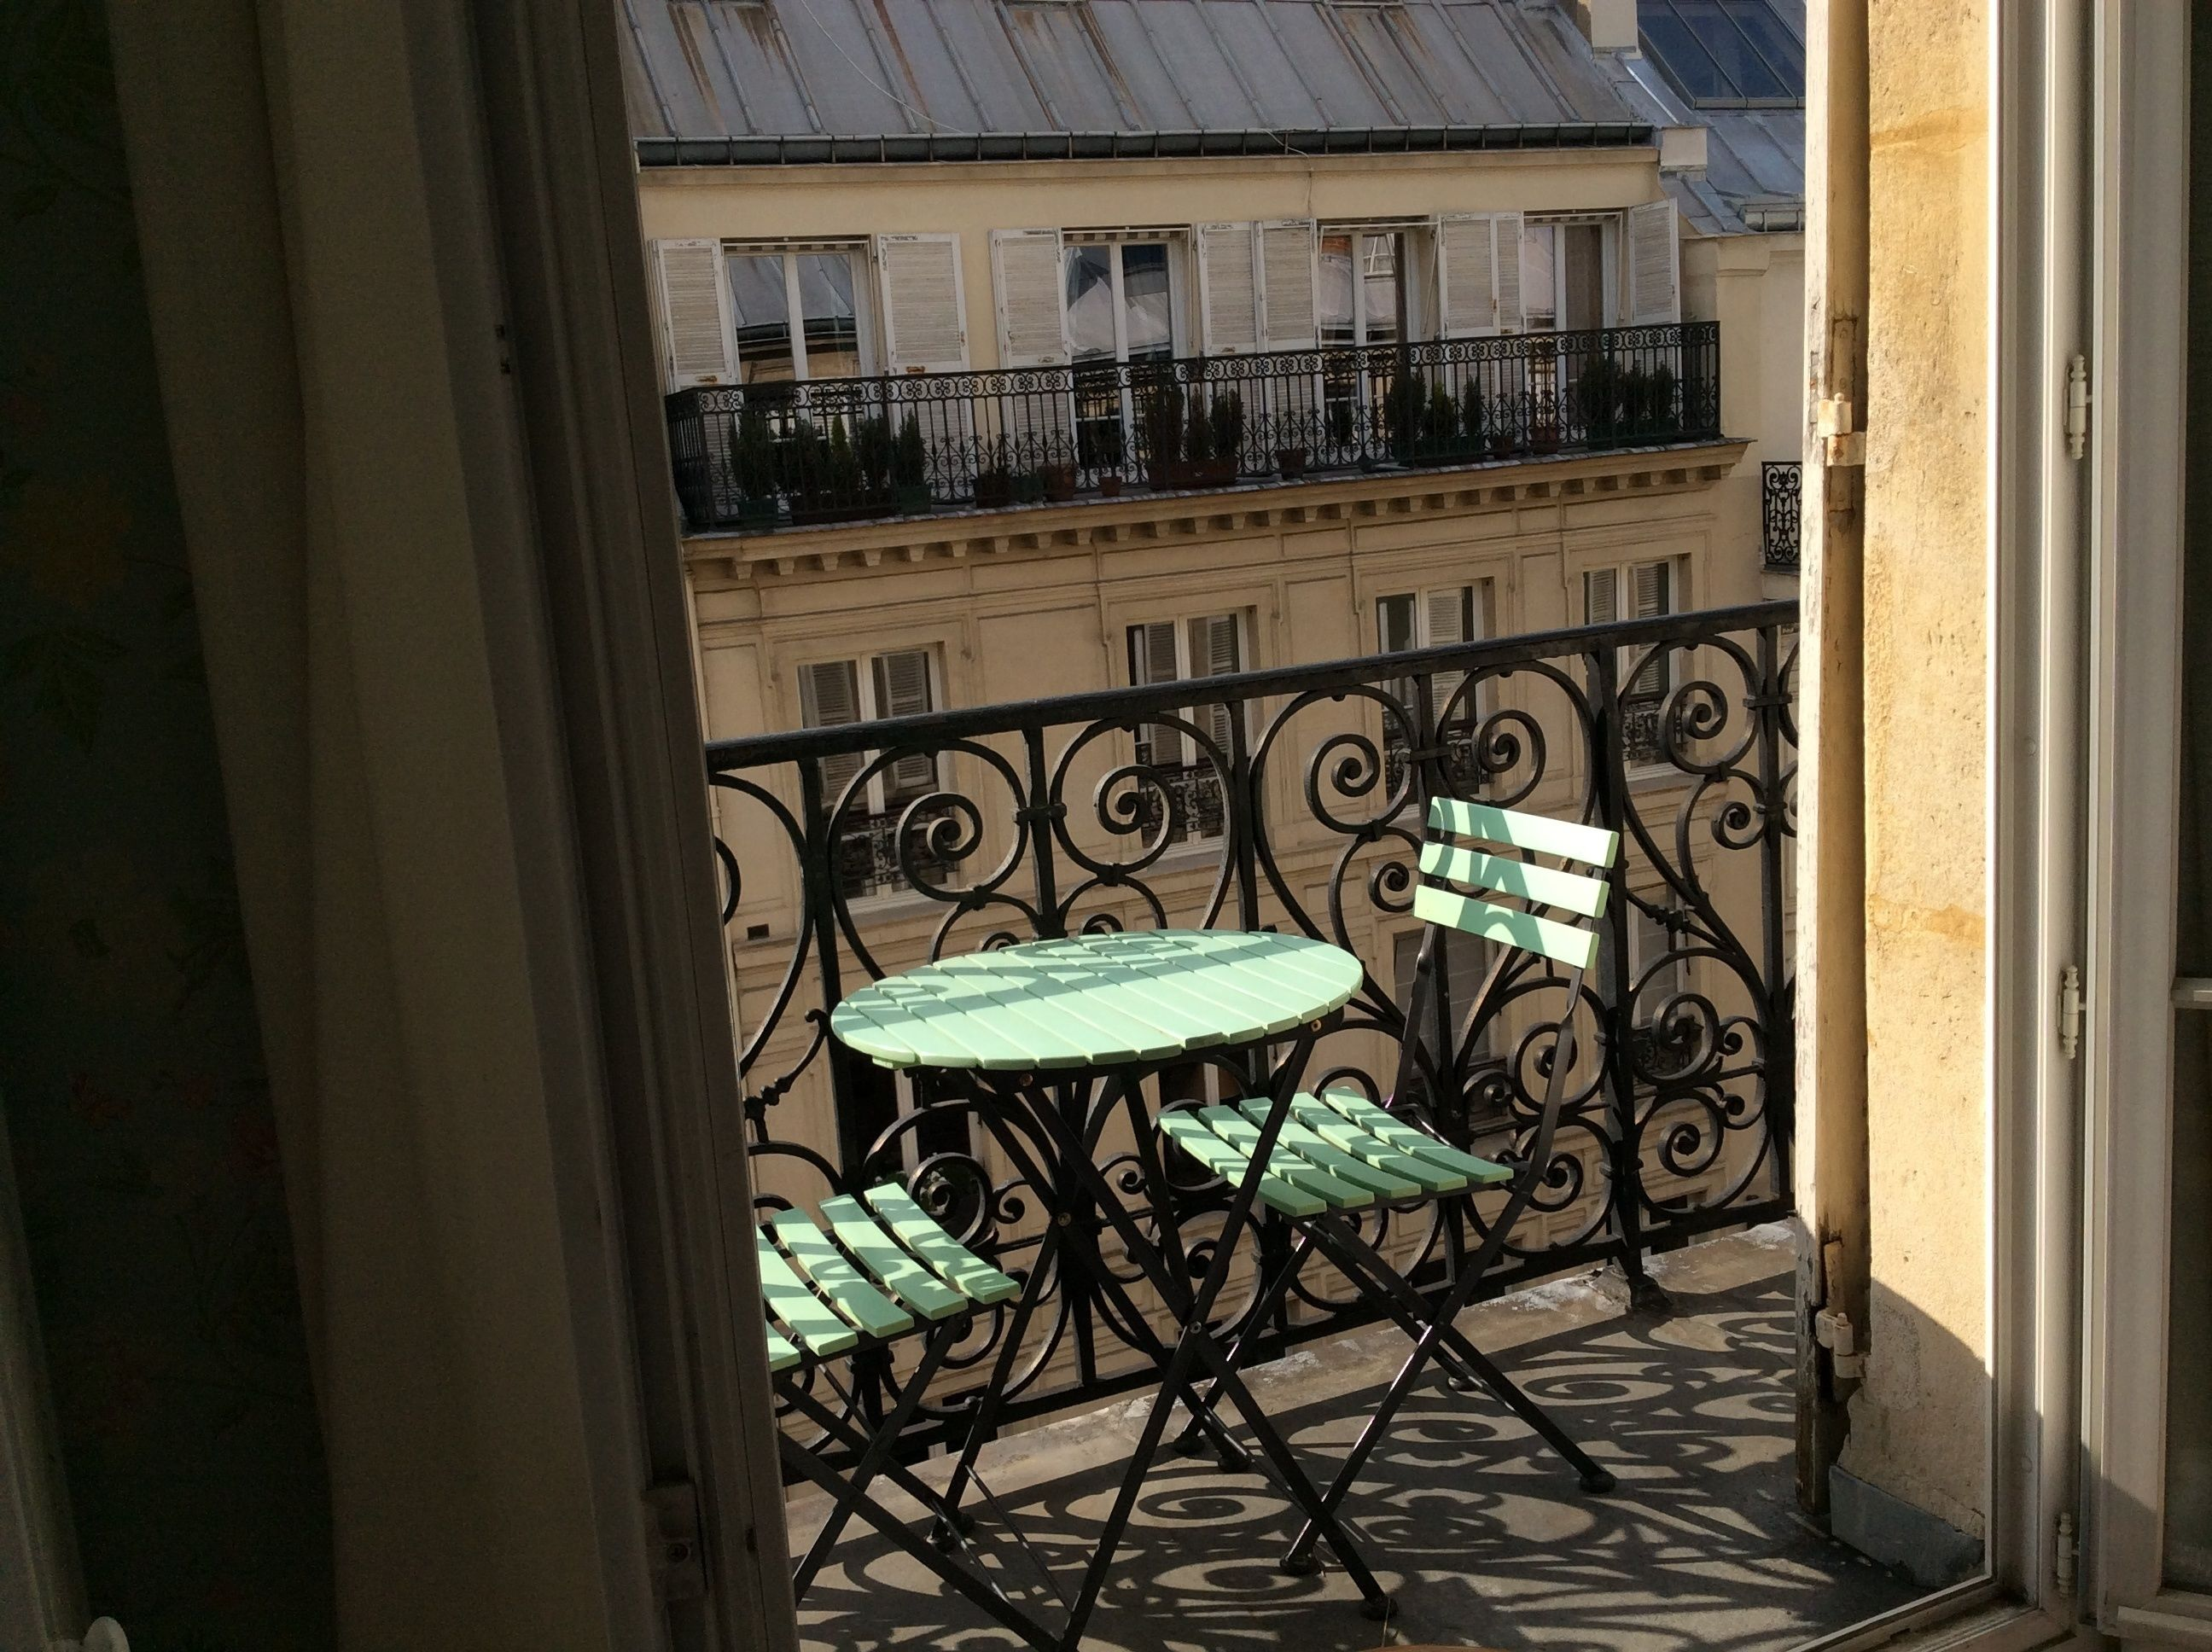 Chambres D'hotes Quartier Champs Elysees